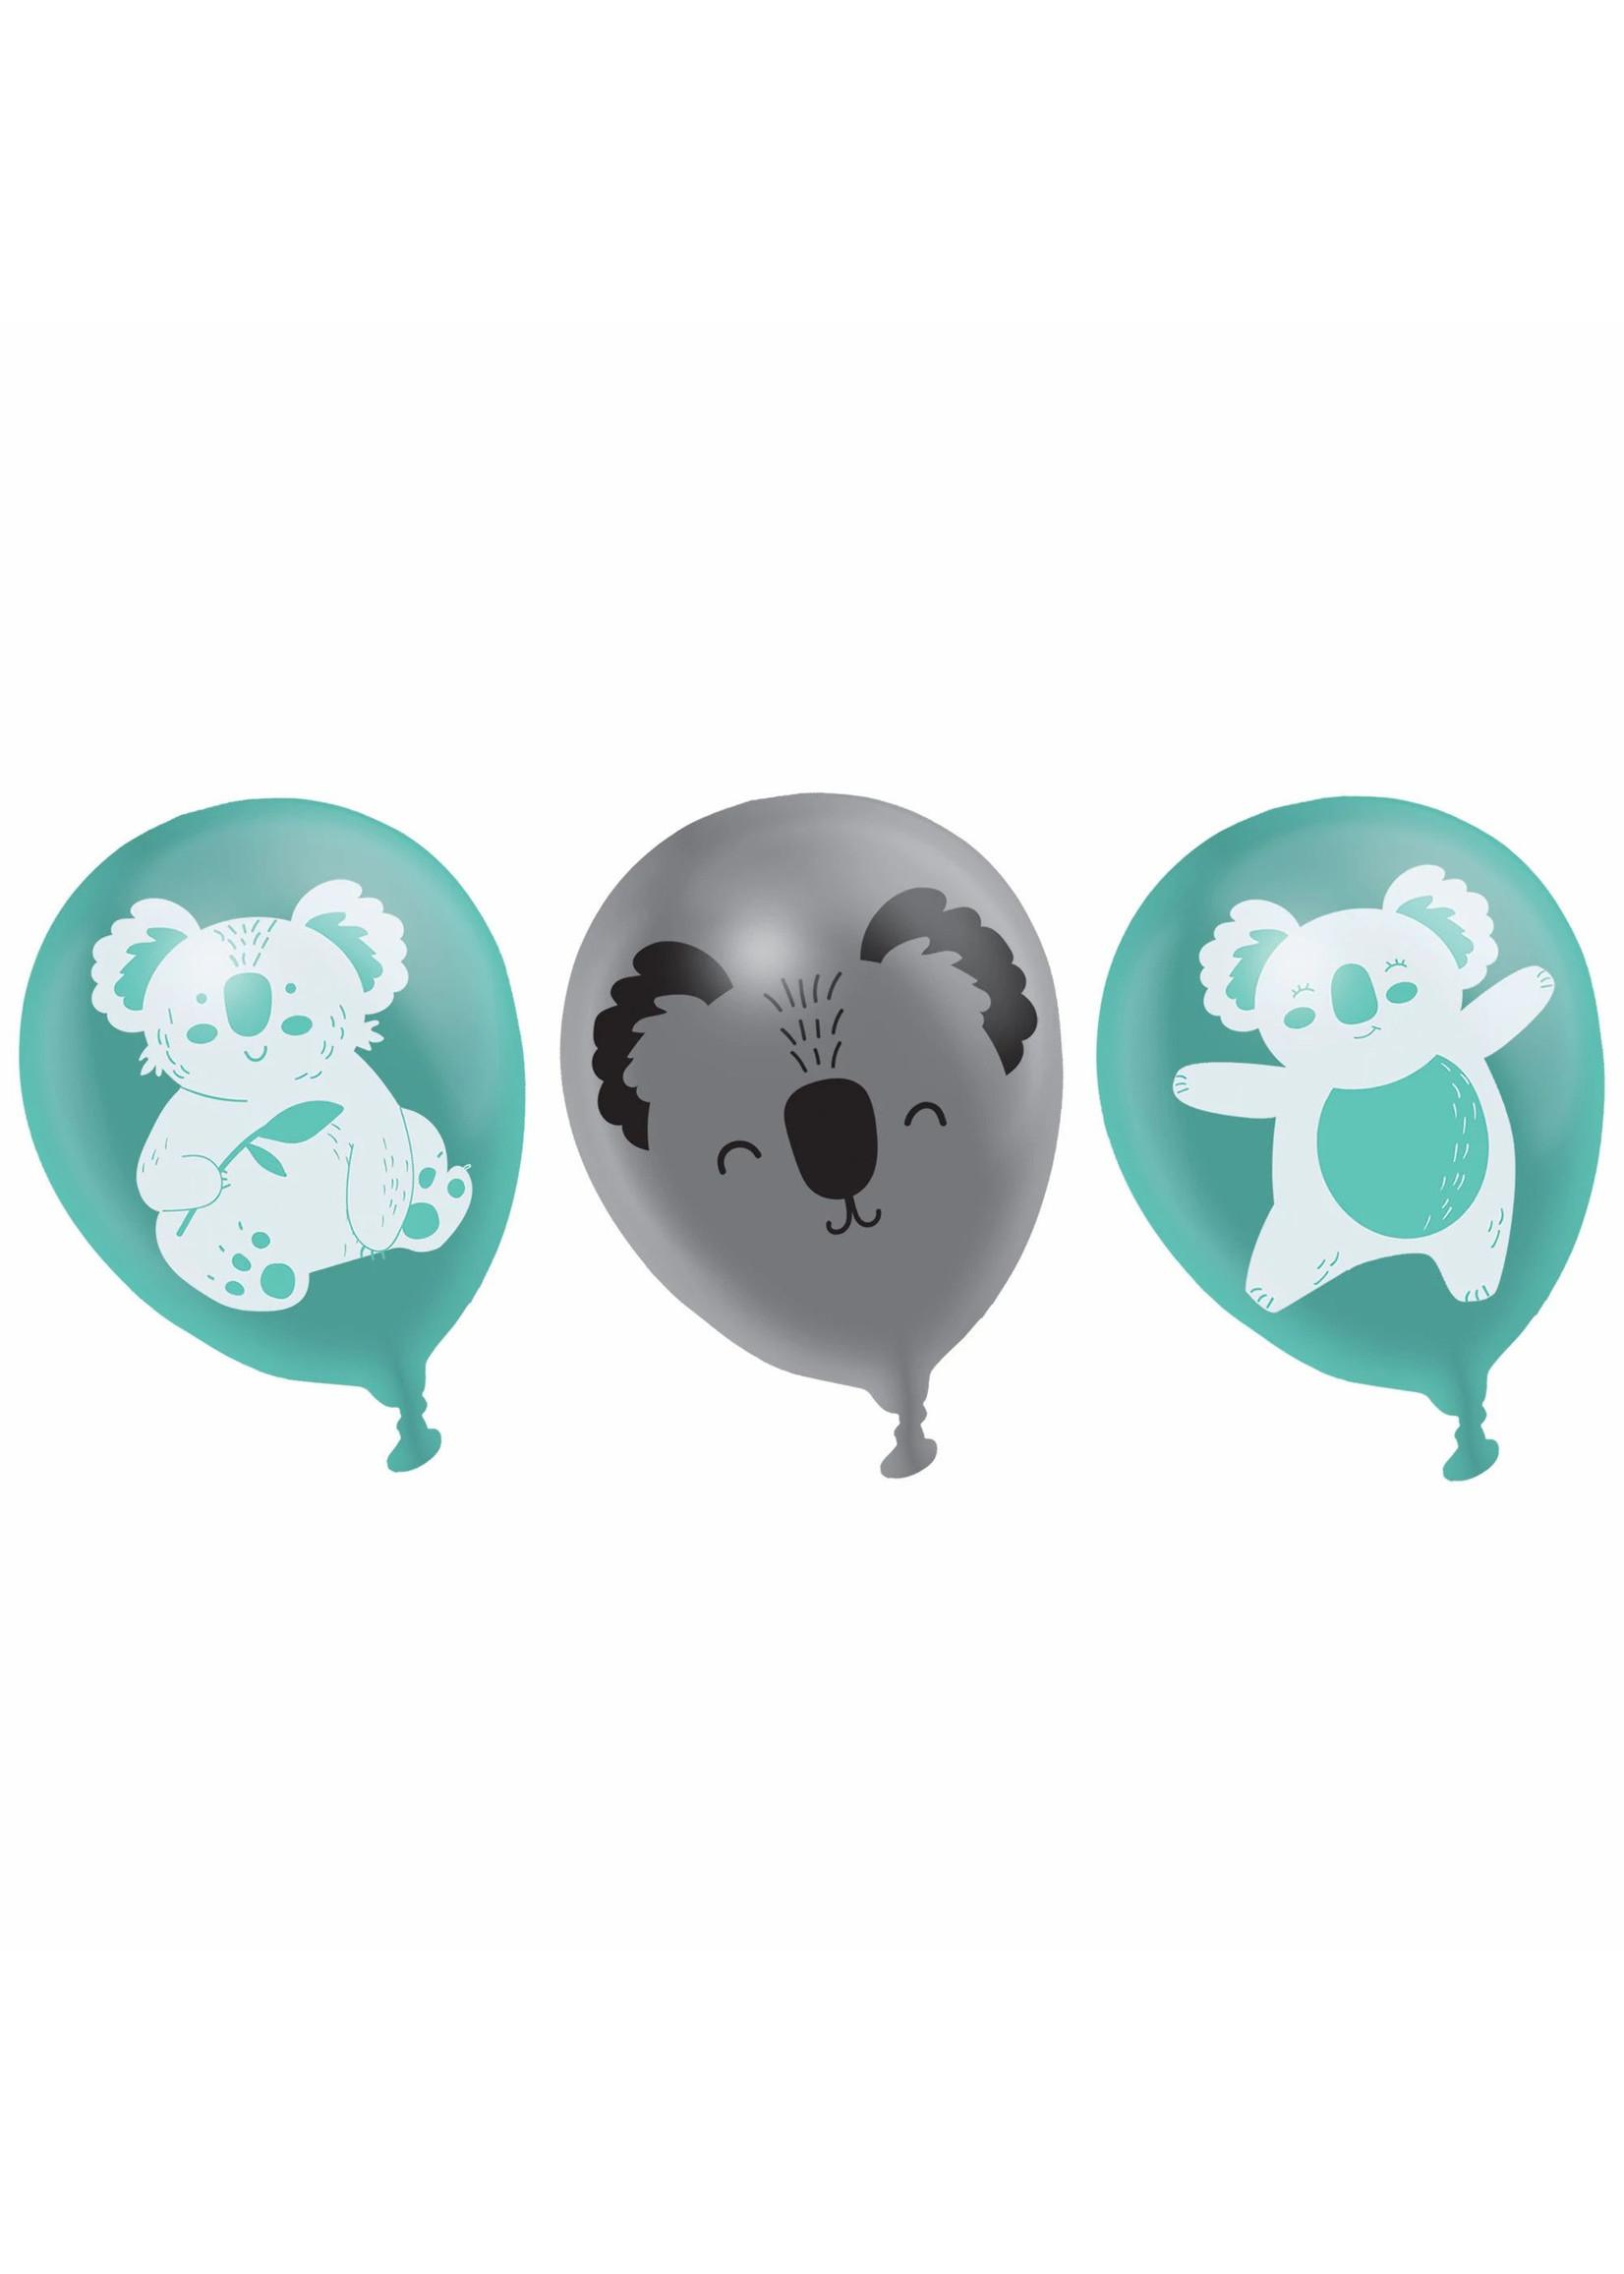 Koala Latex Balloons - 6ct